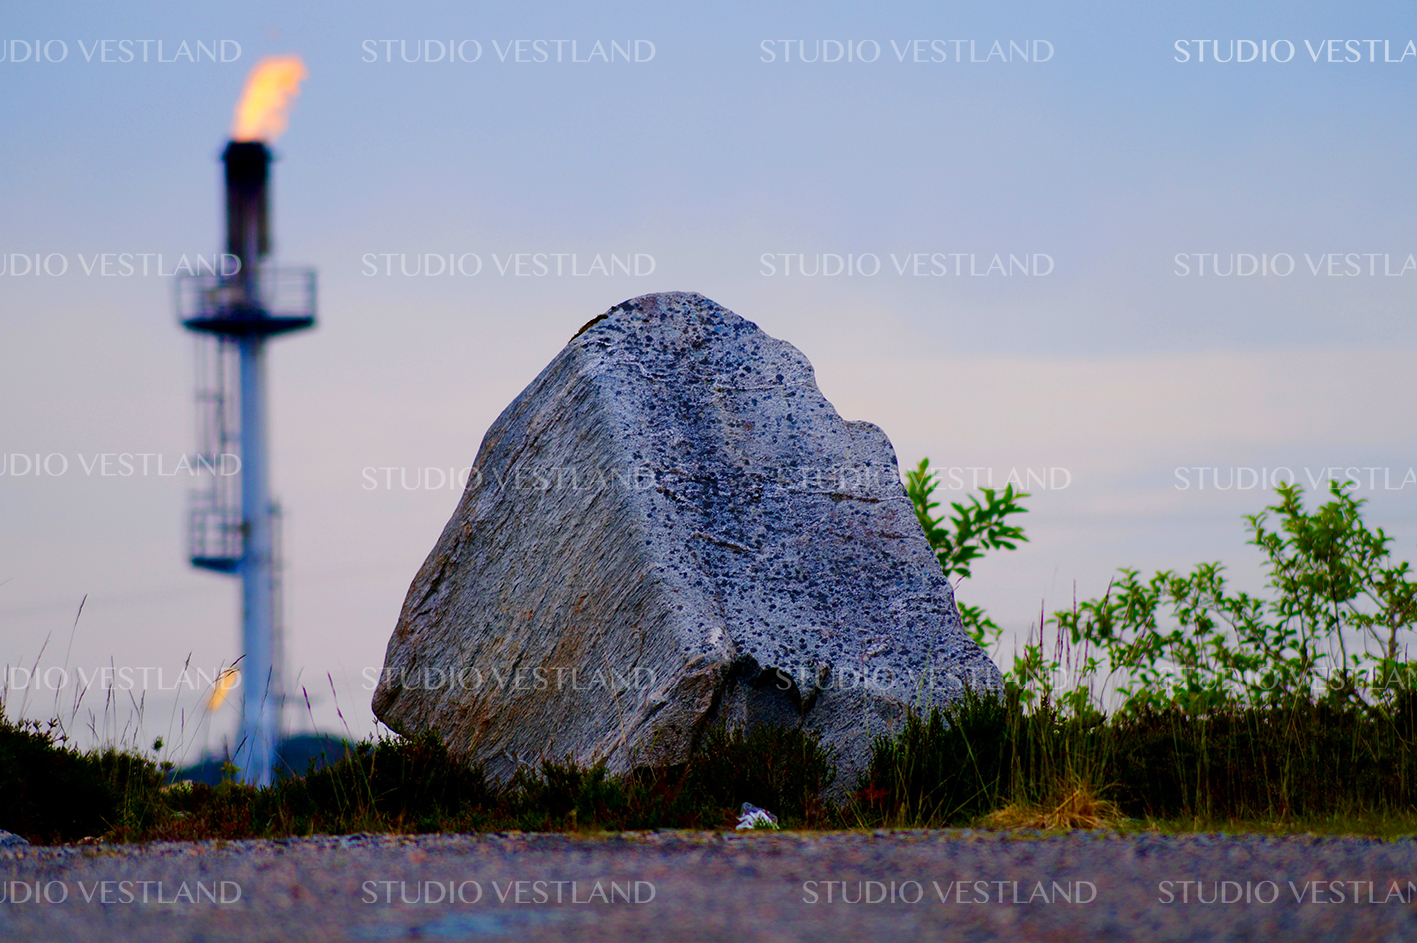 Studio Vestland - Gass og stein 02